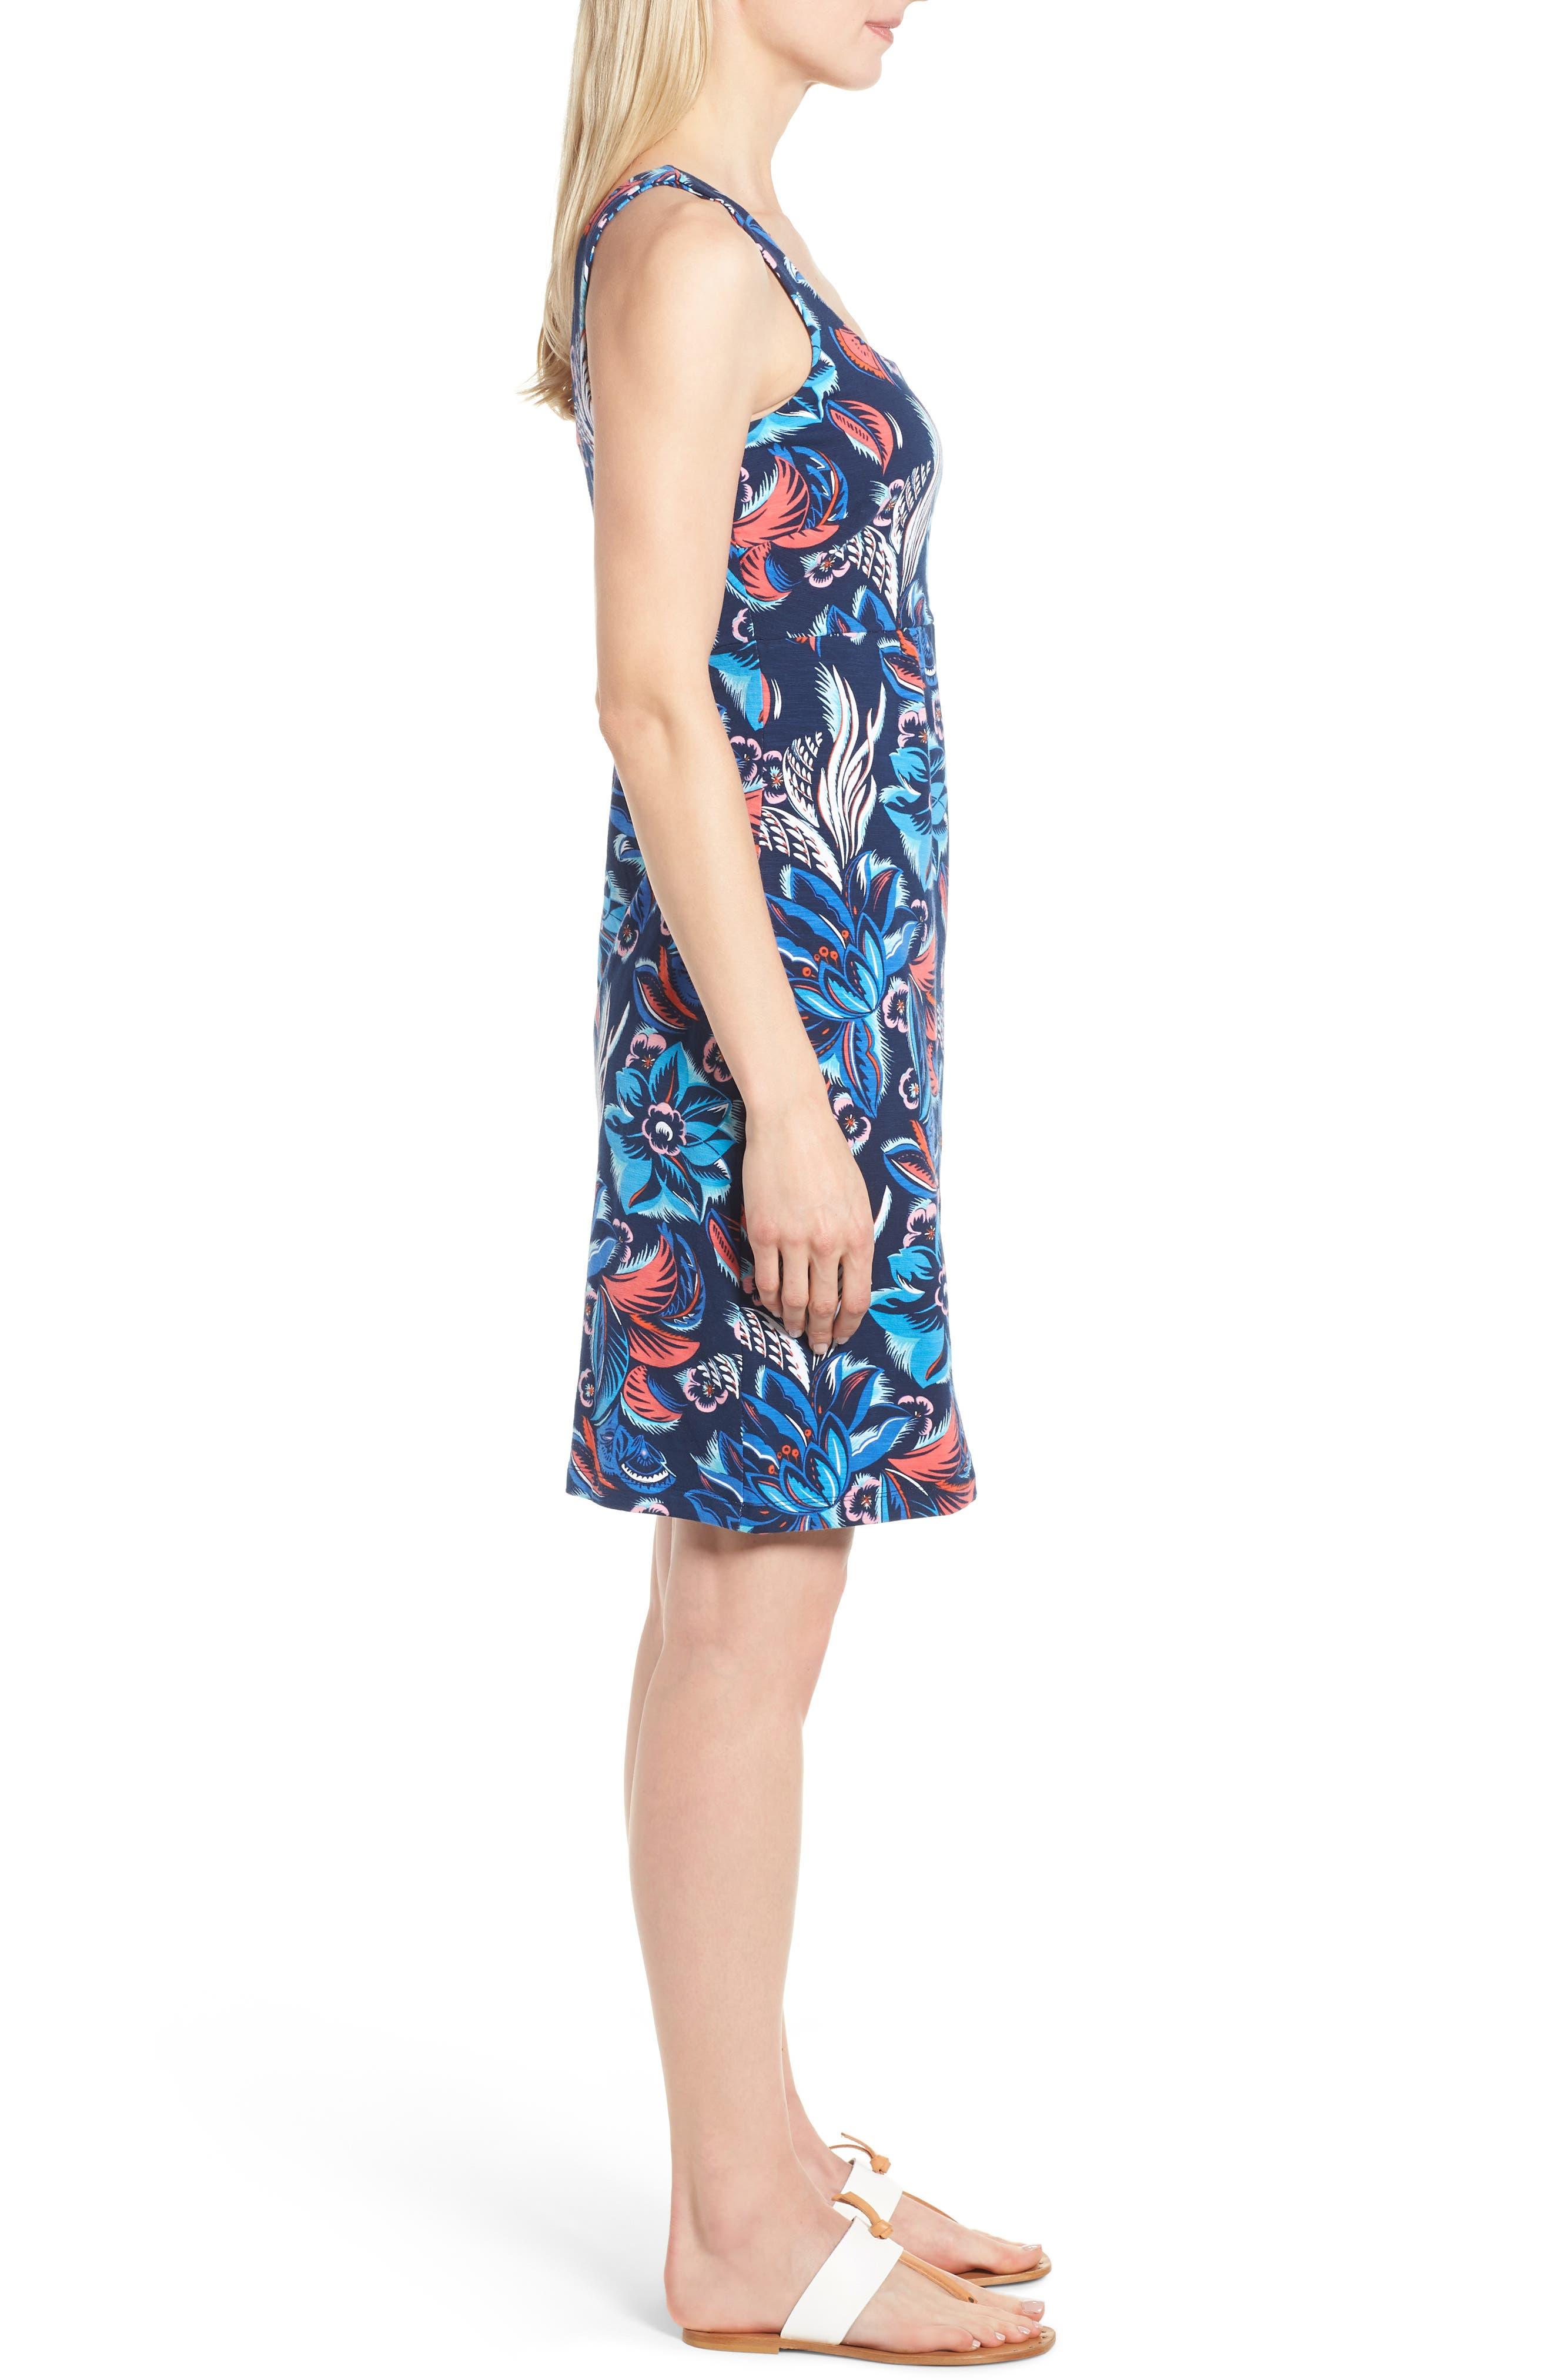 Bohemian Blossoms Tank Dress,                             Alternate thumbnail 3, color,                             OCEAN DEEP